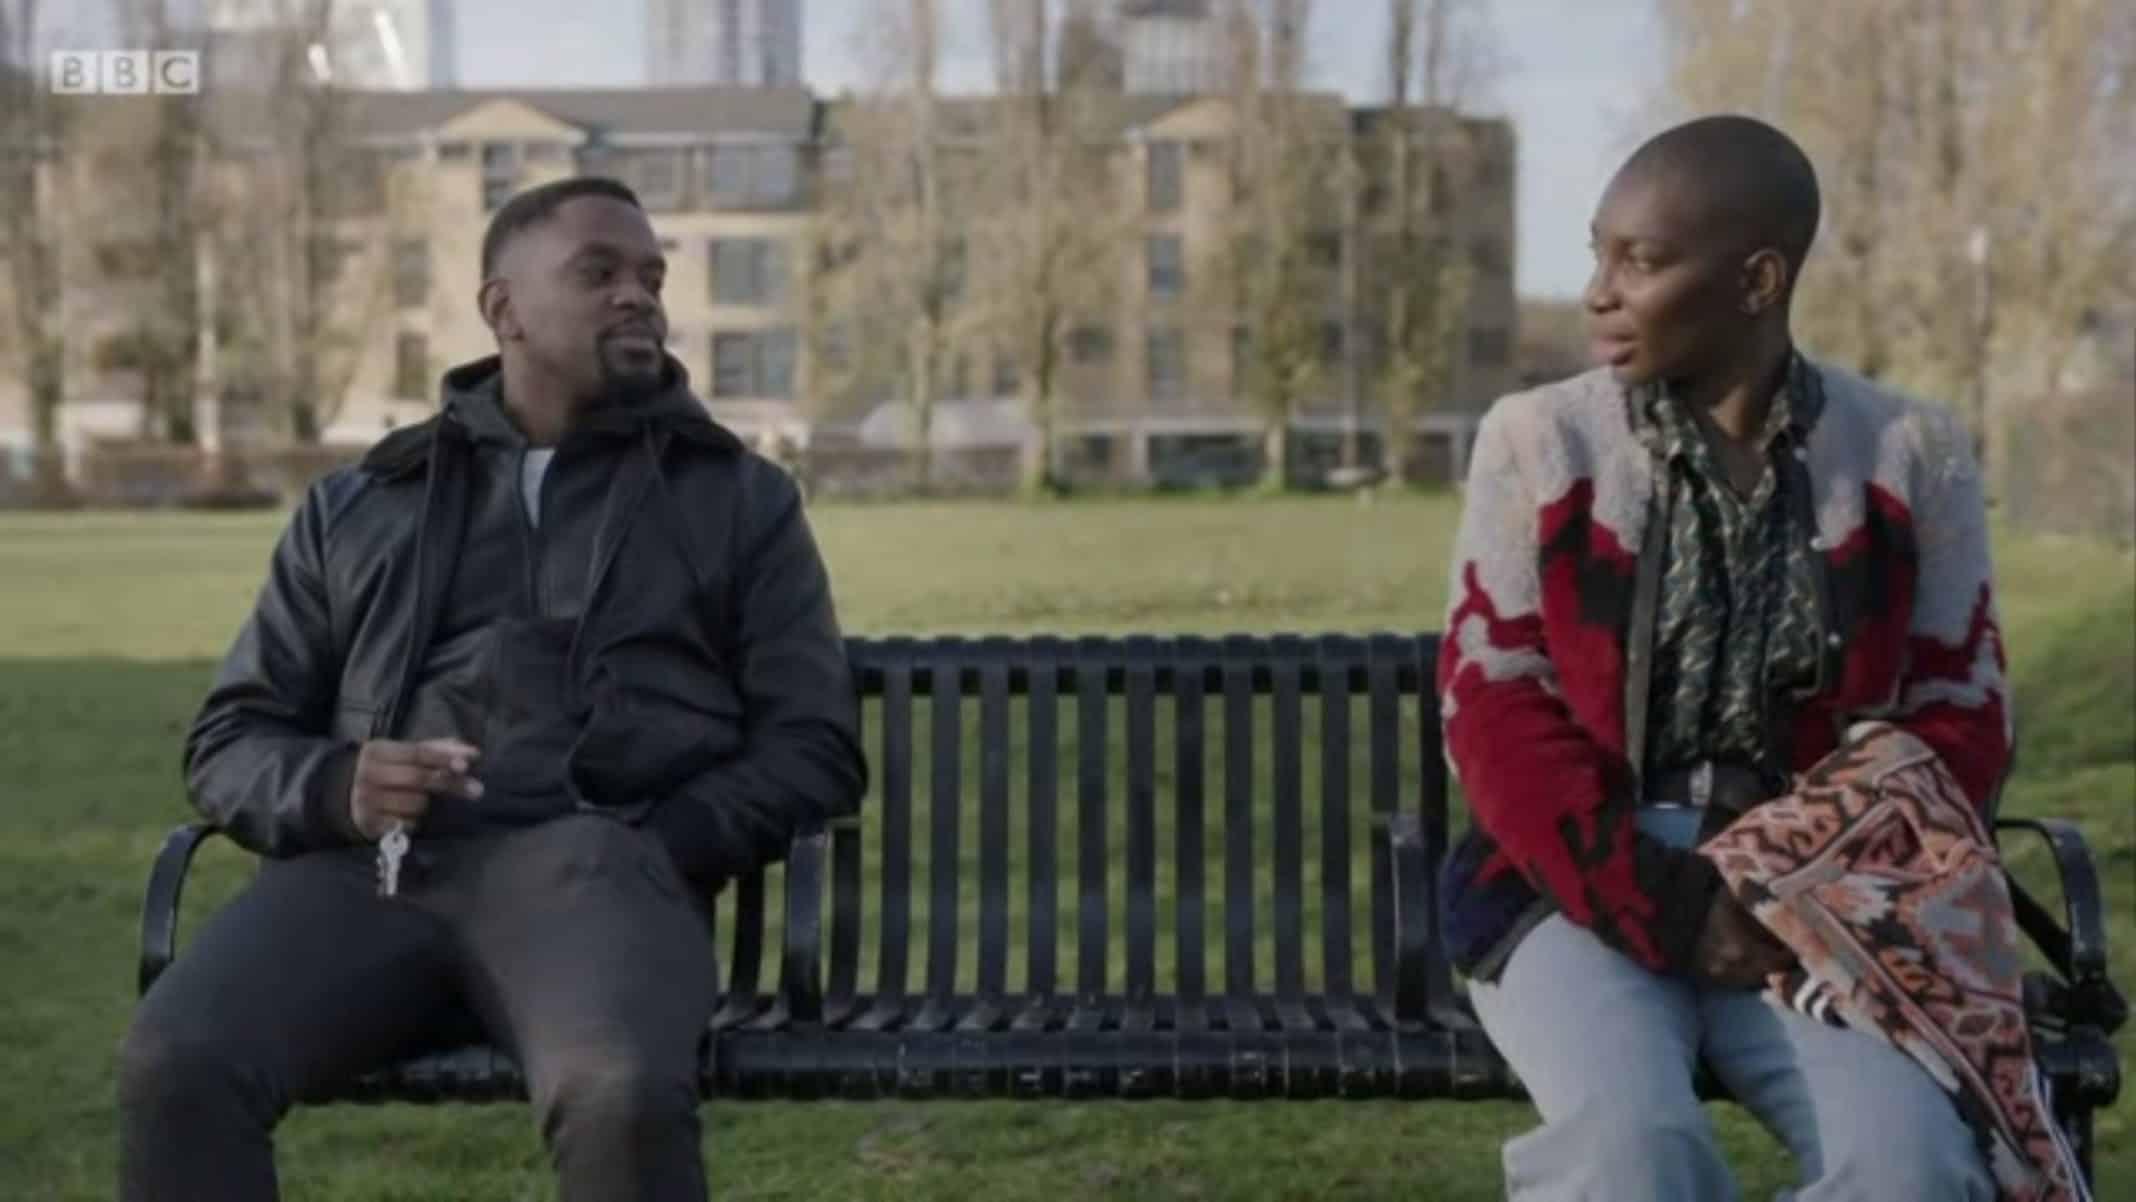 Simon (Aml Ameen) and Arabella (Michaela Coel) talking on a bench.